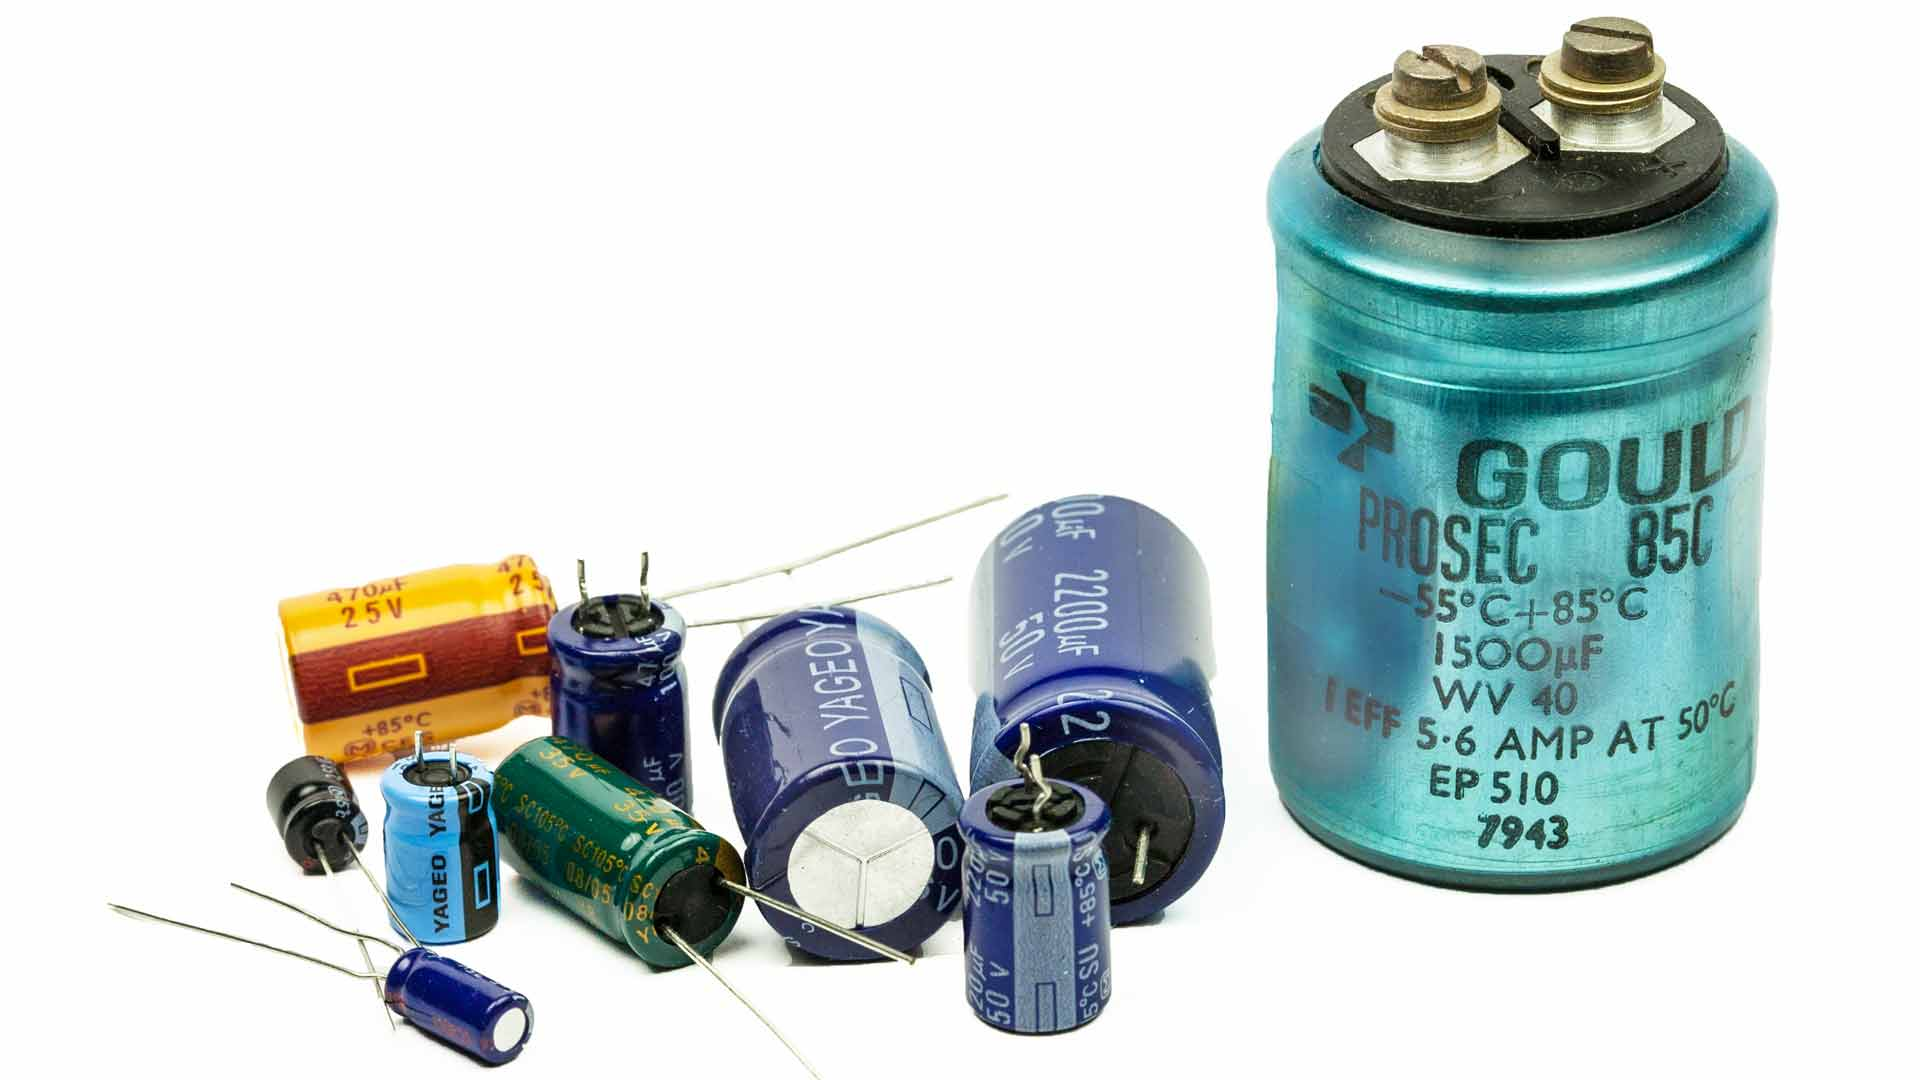 electrolytic capacitor aluminium electrolytic electronics notesElectrolytic Capacitors Picture Of Good Electronic Circuit #2